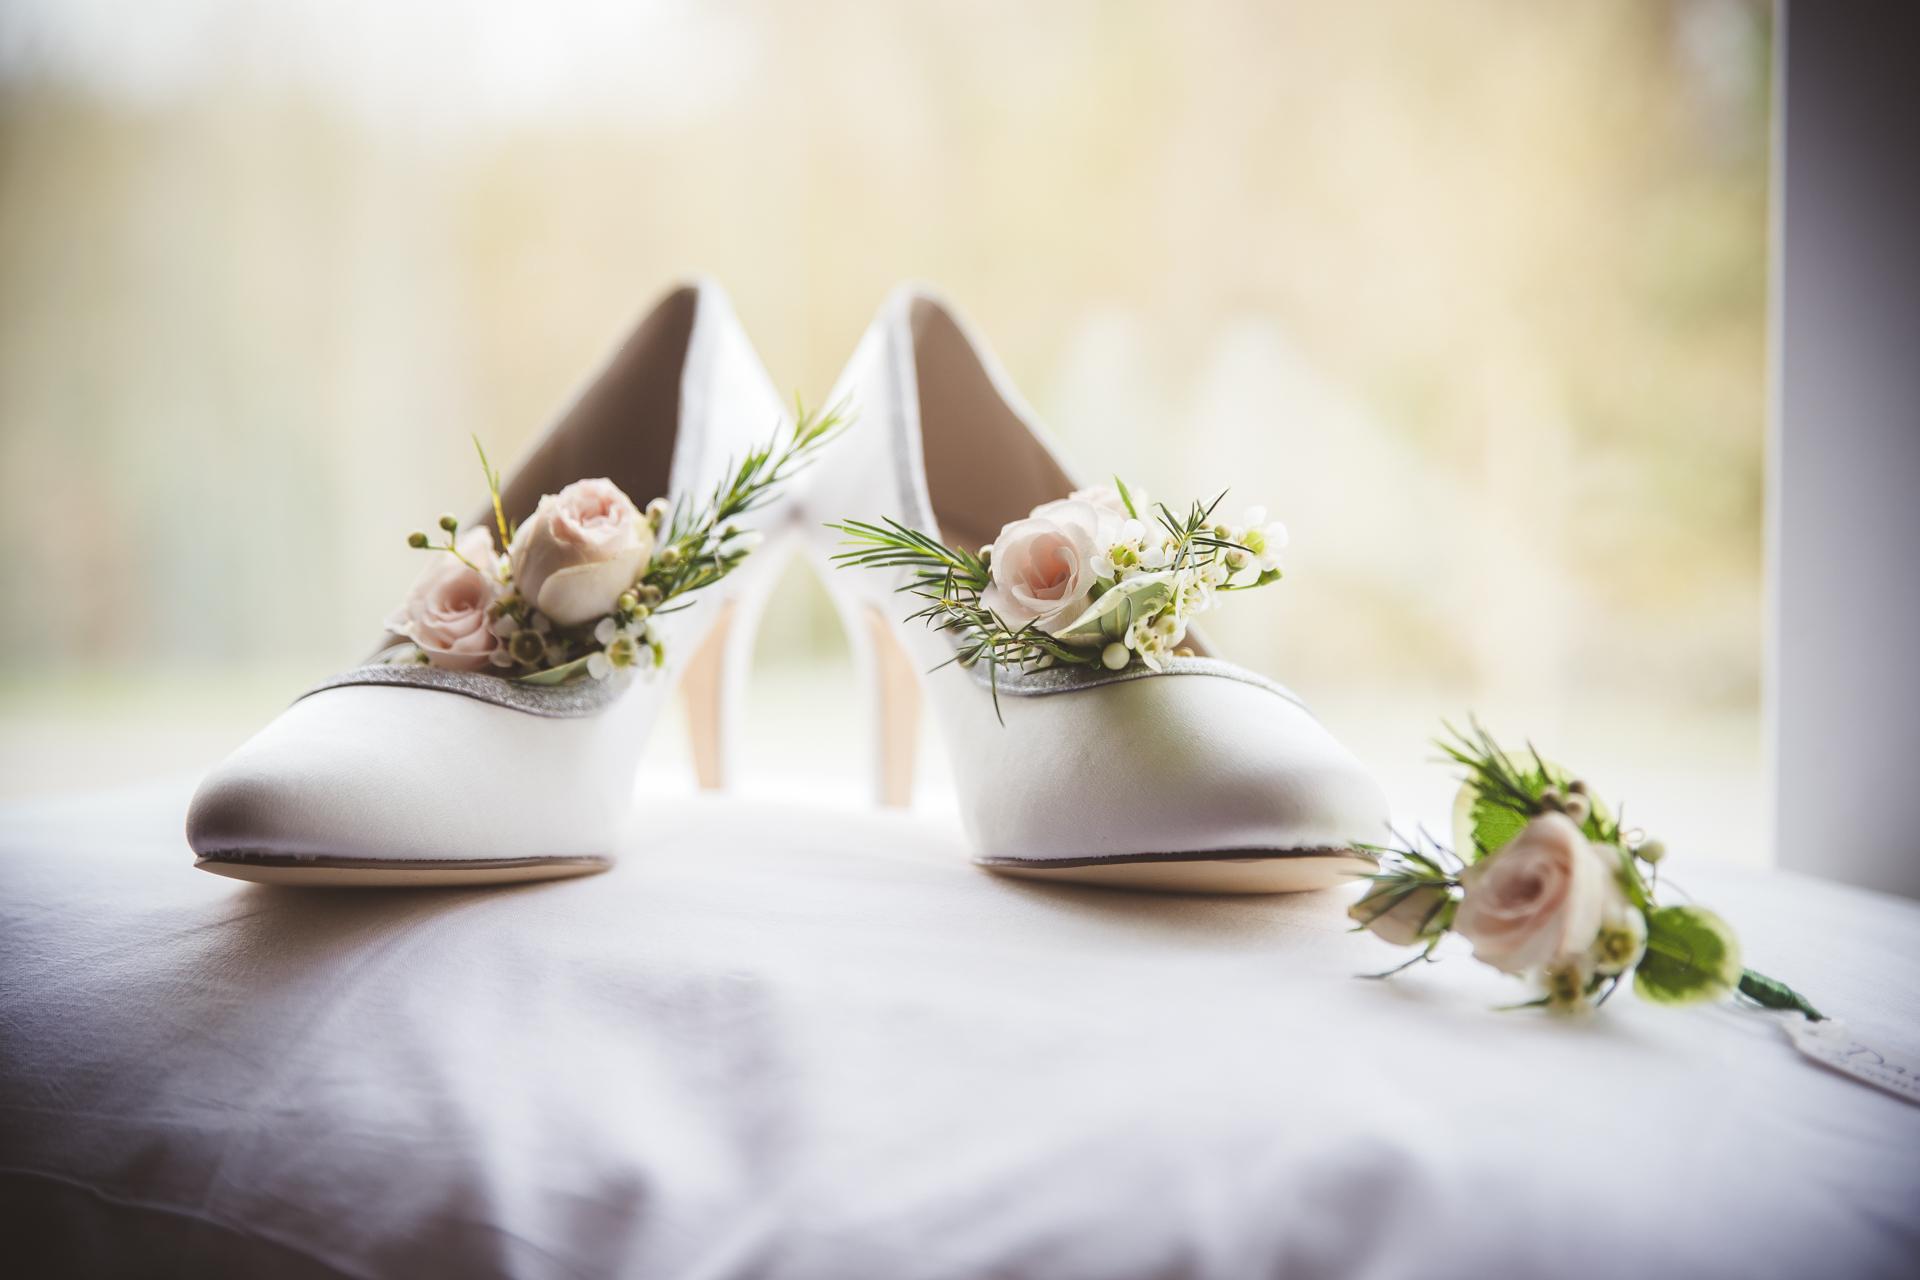 Samantha's wedding shoes